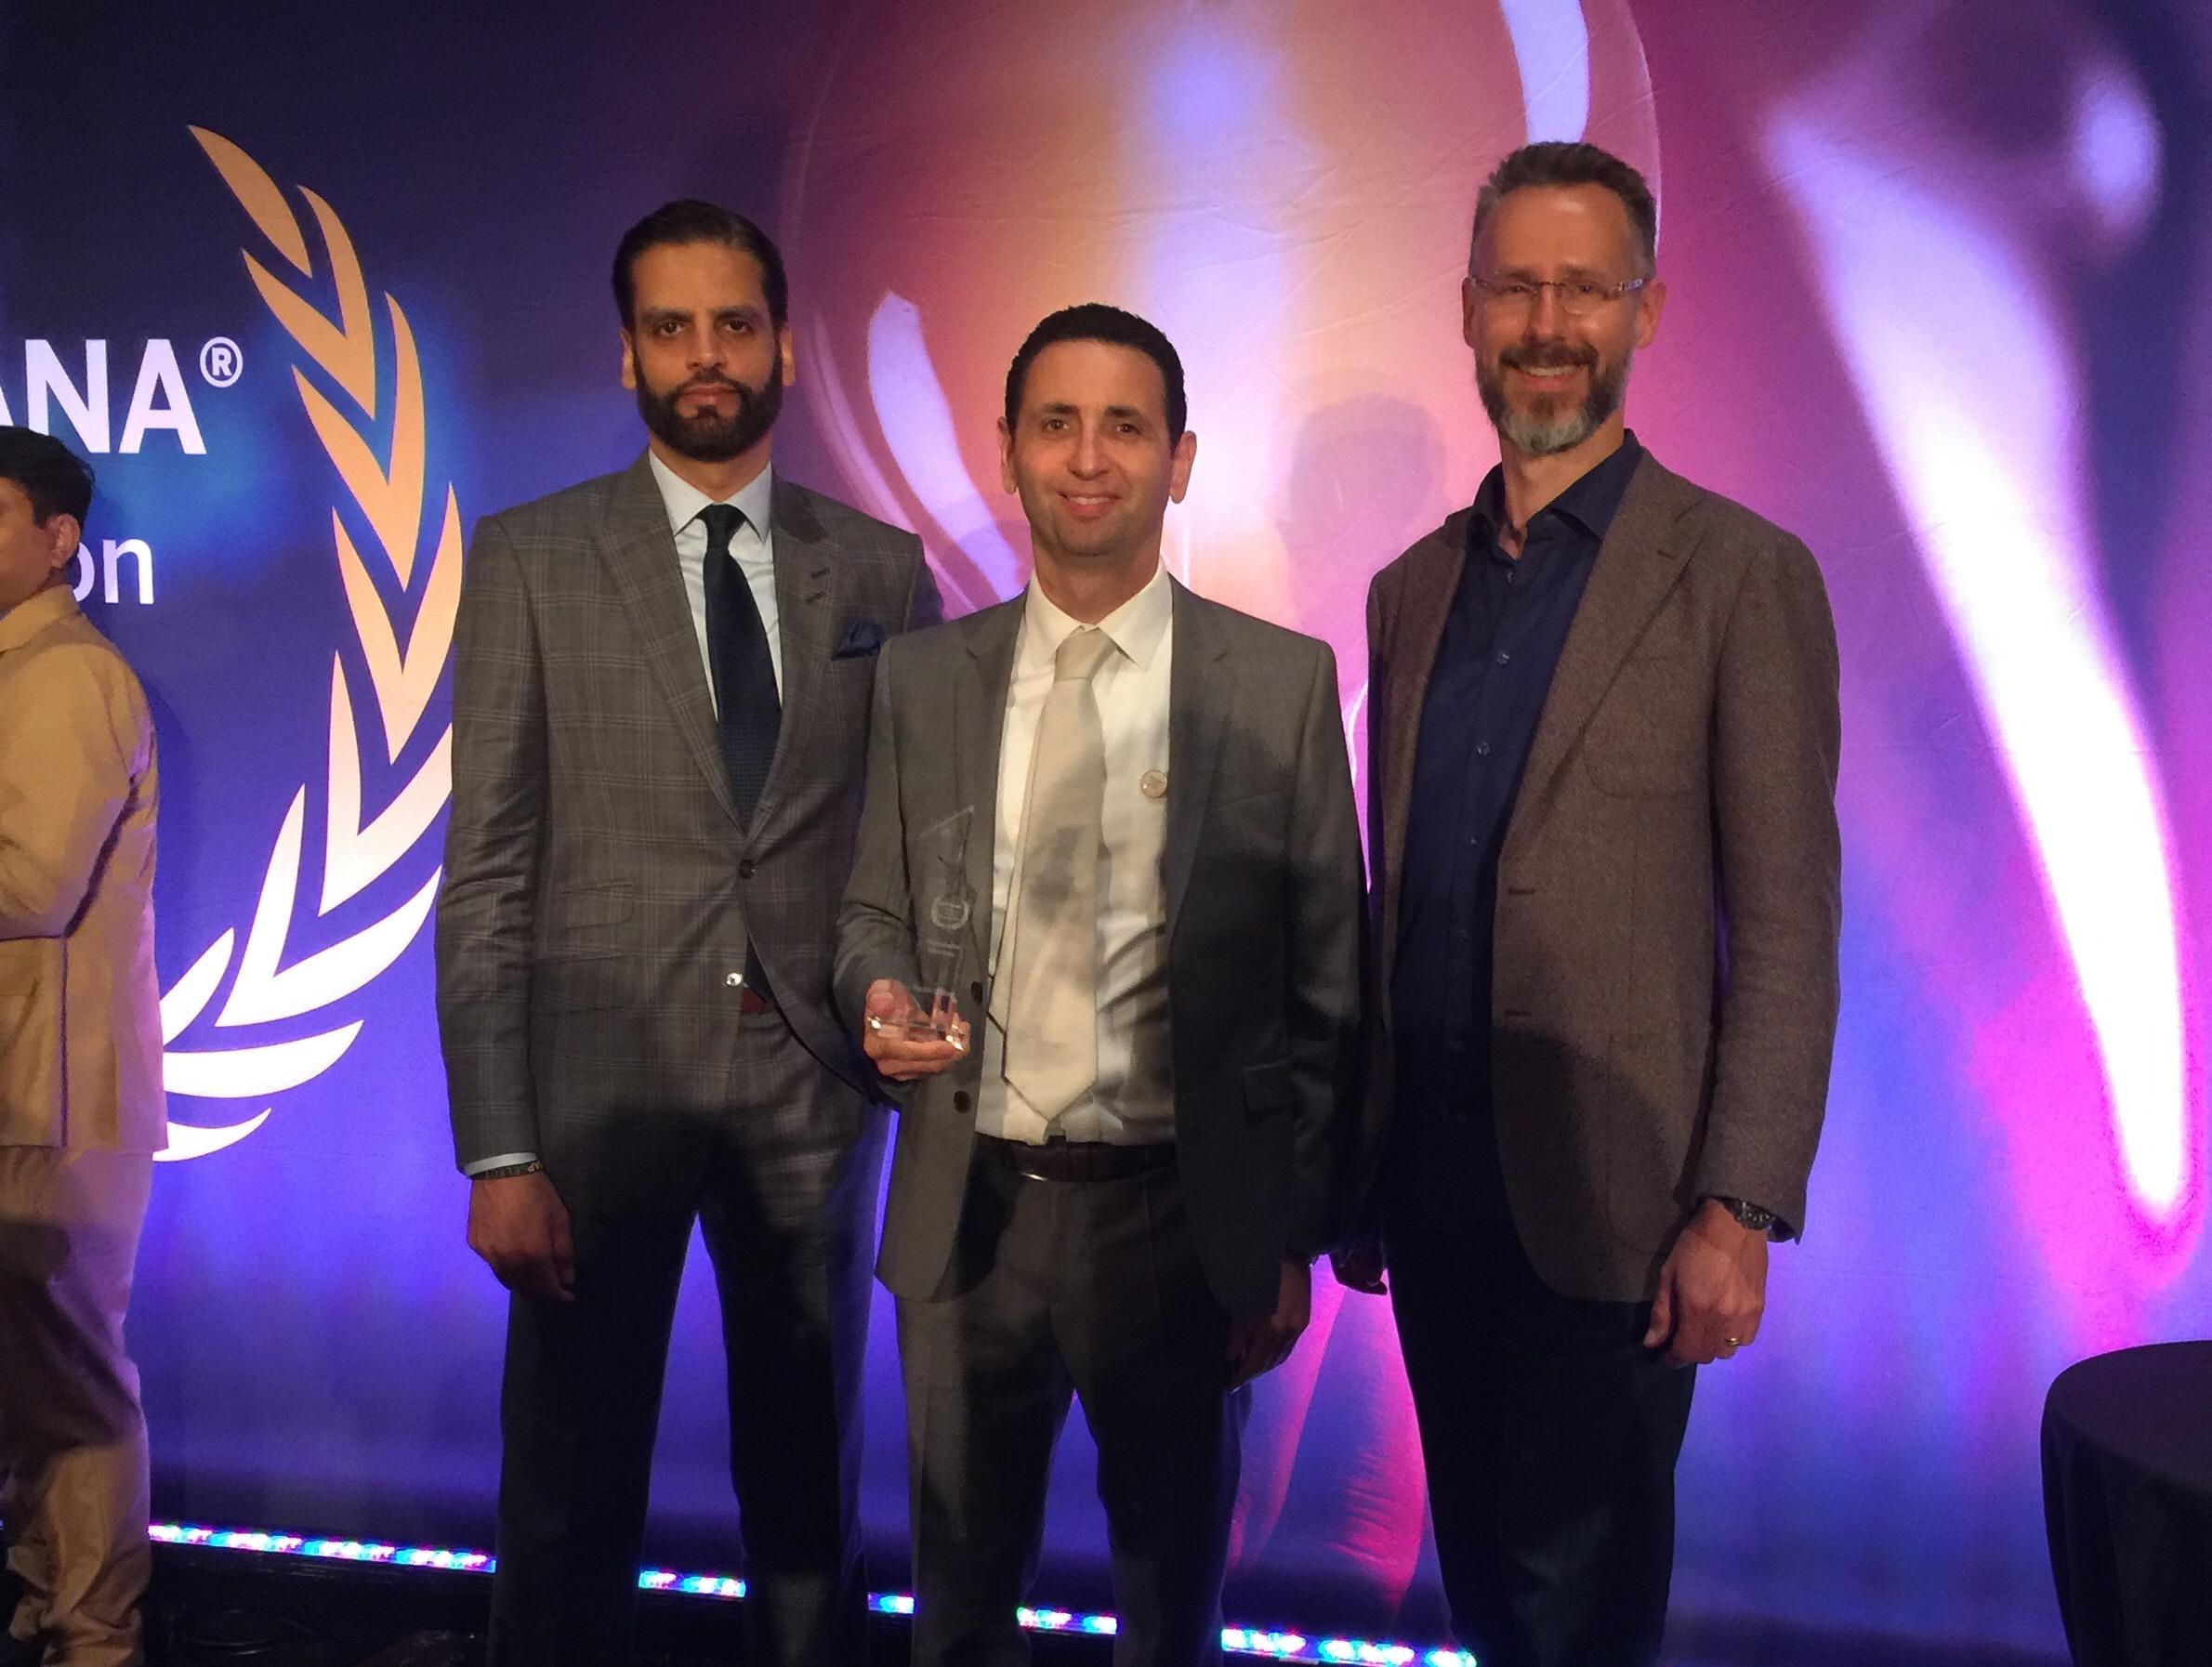 2017 HANA Innovation Awards